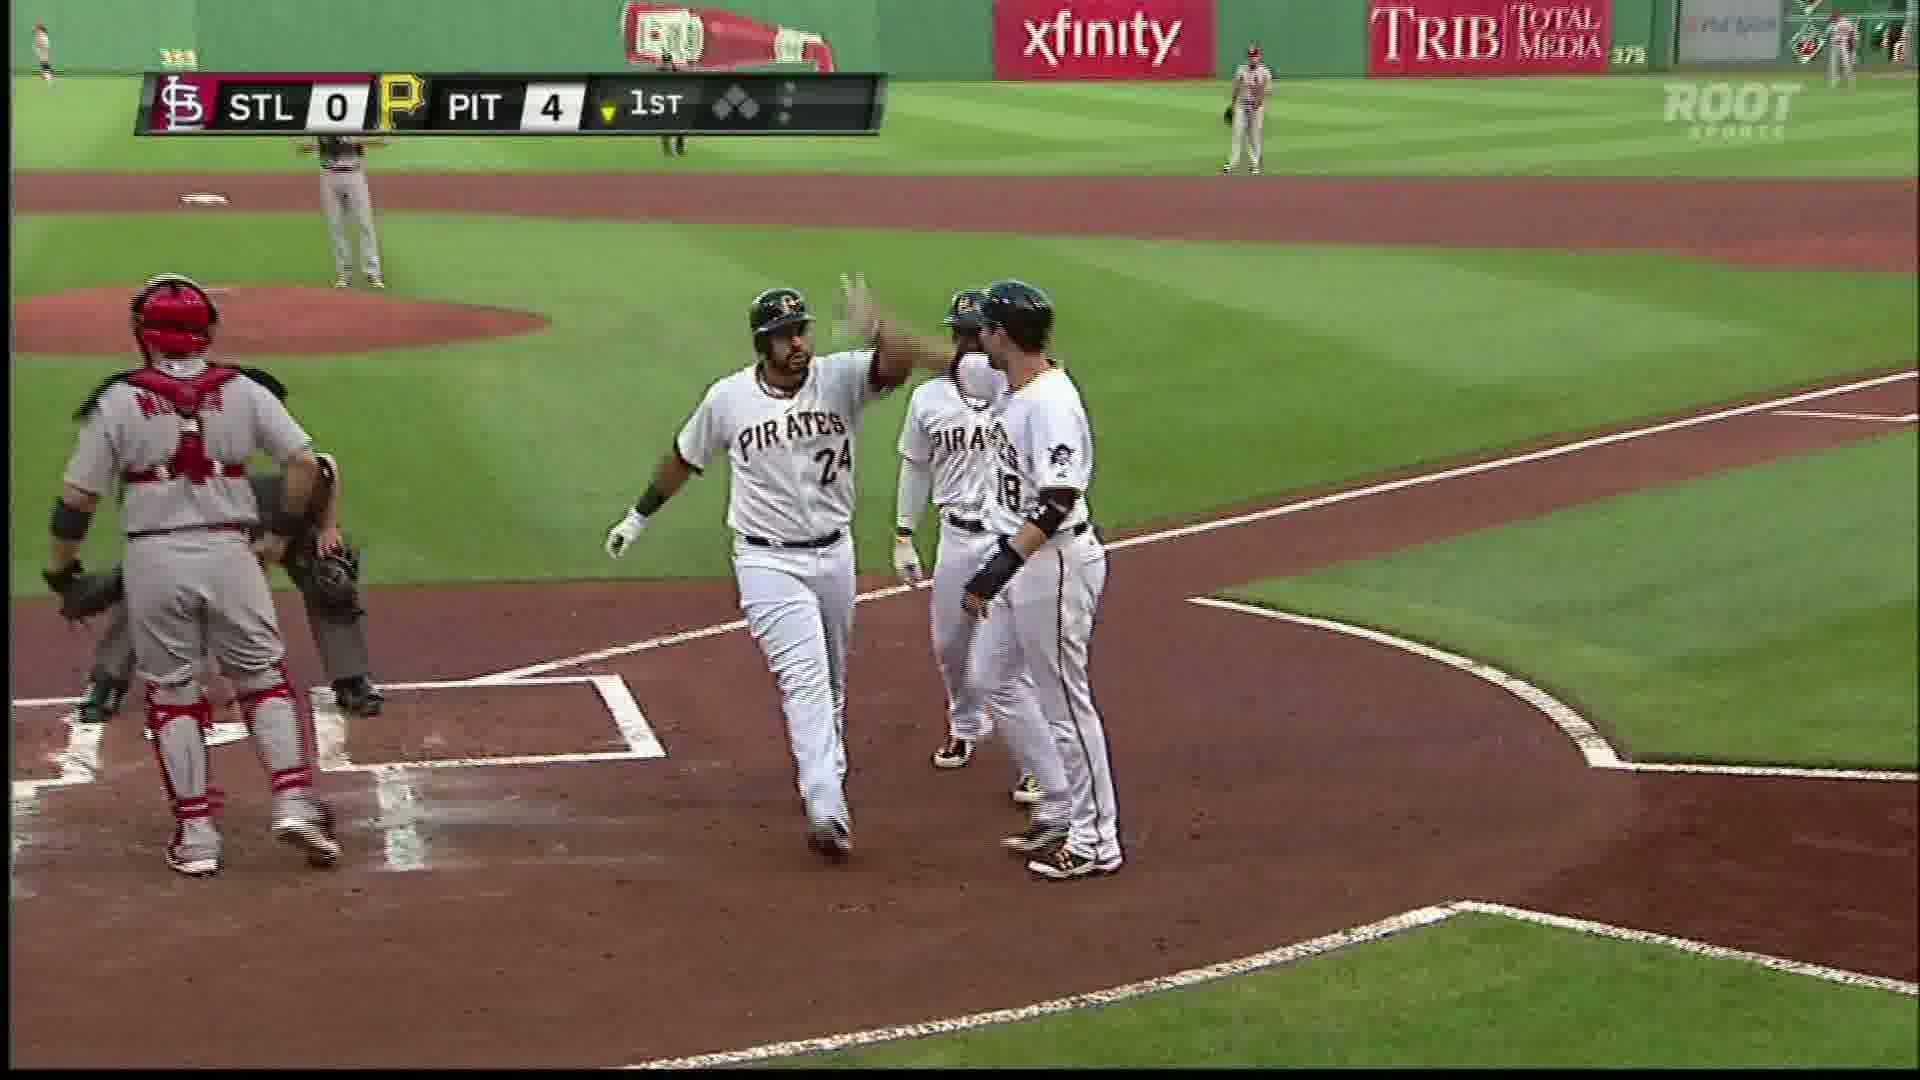 Pedro Alvarez celebrates his 27th home run Monday night against St. Louis.